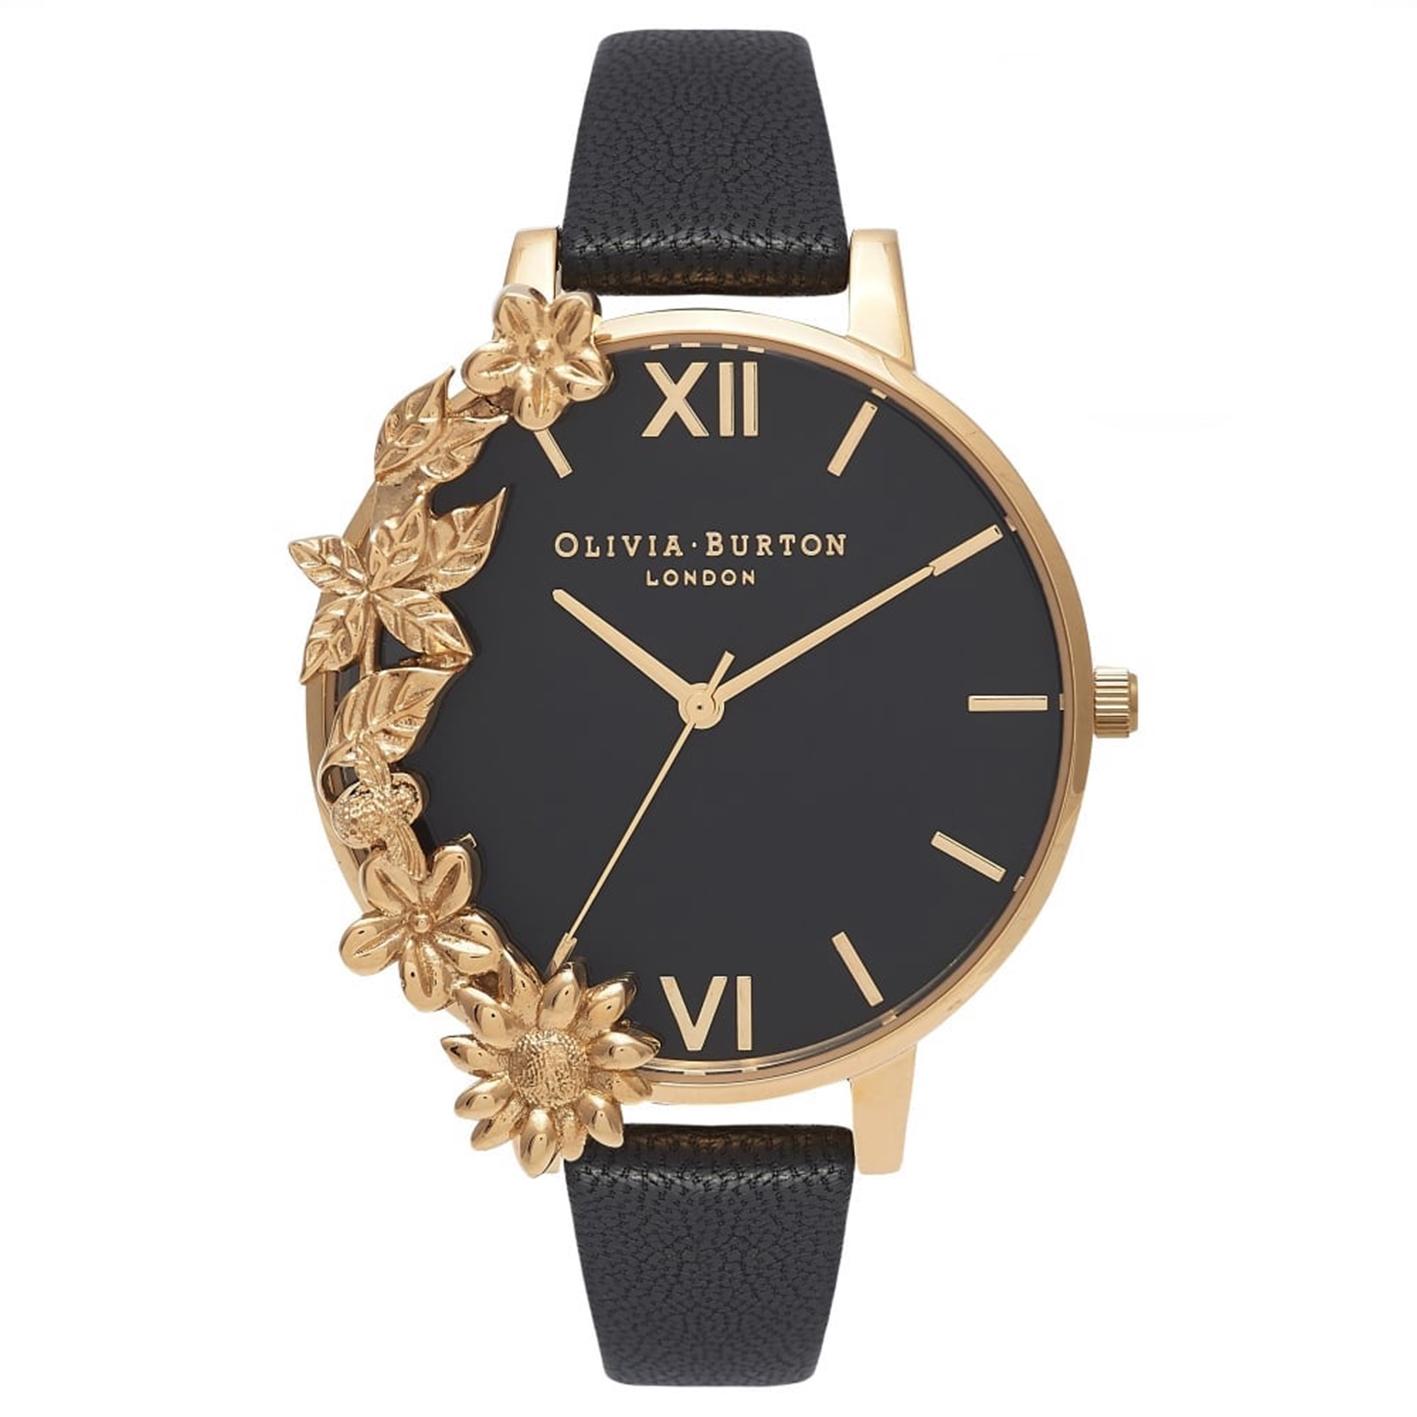 Case Cuff Black Dial & Gold Watch, £115, Olivia Burton